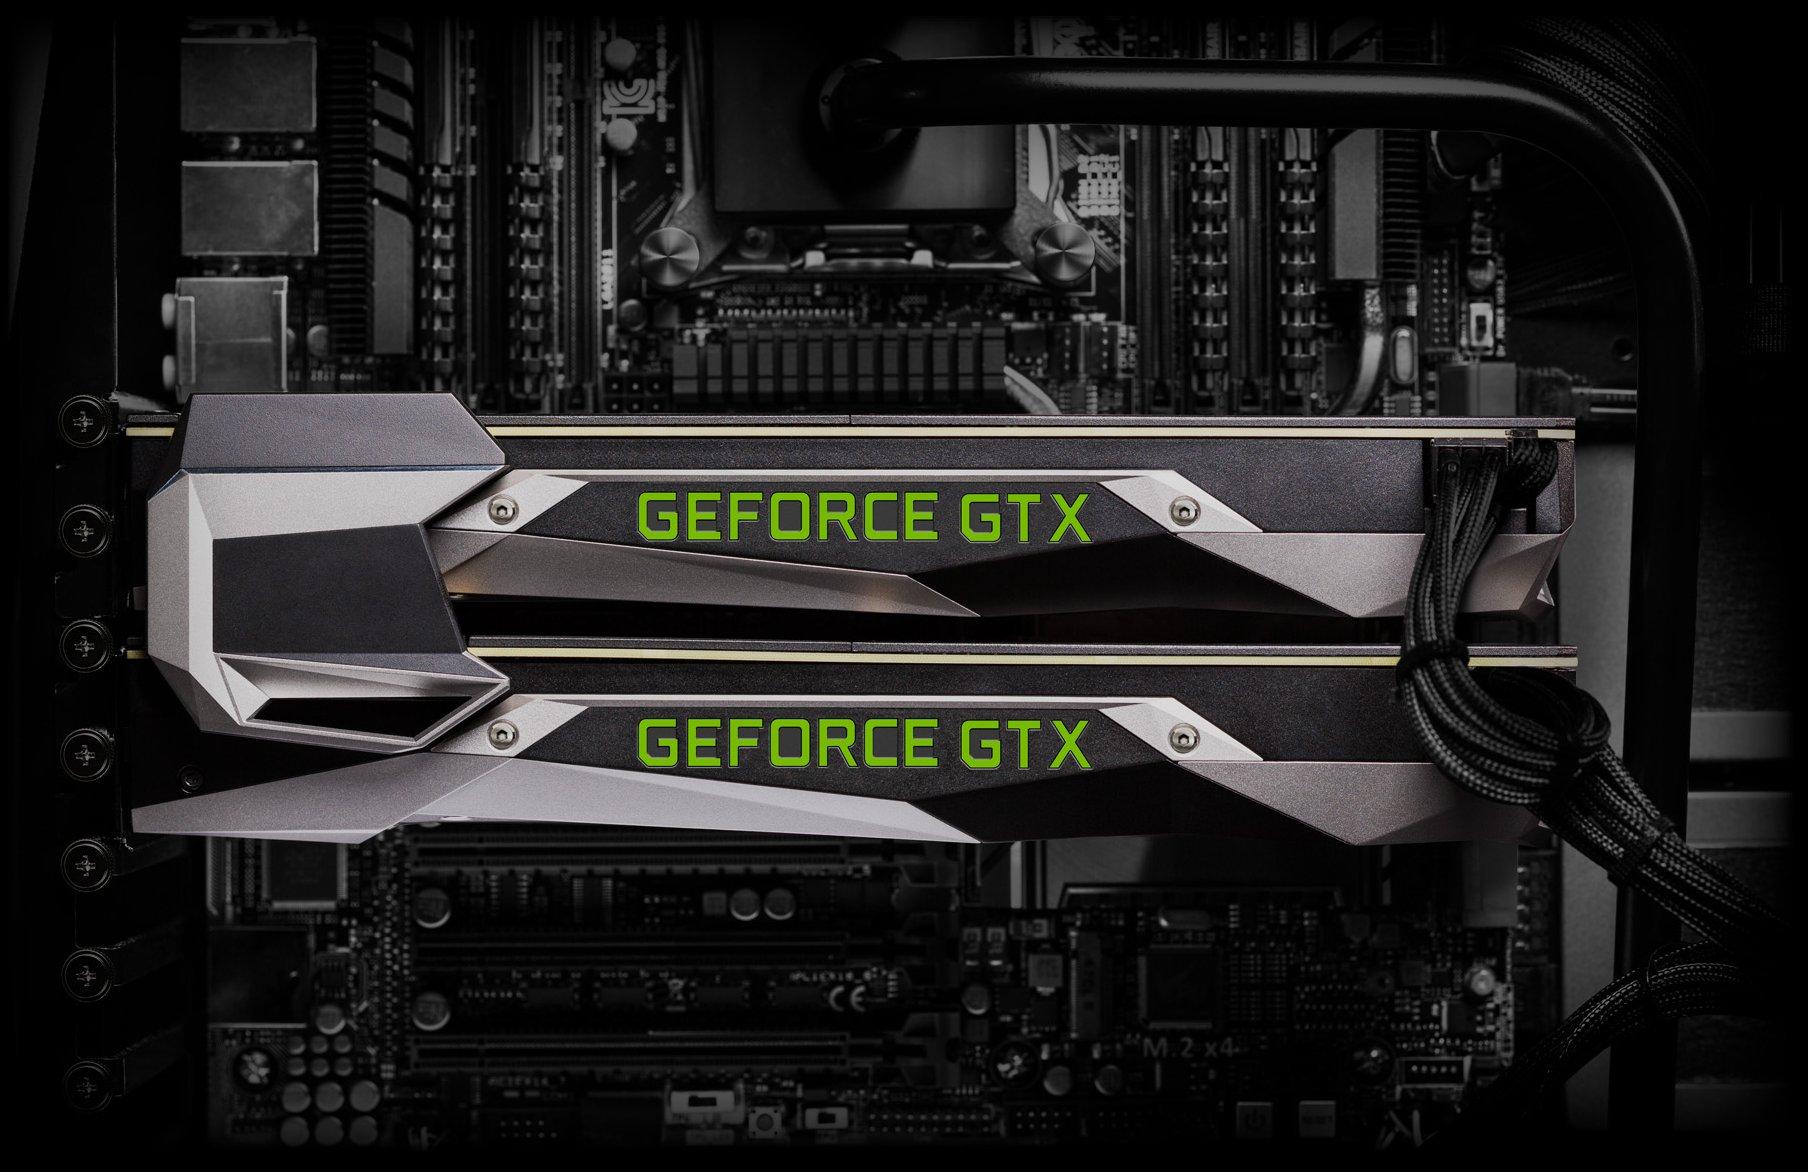 nvidia, gpu, gaming, video card, graphics cards, titan x, gtx 1080ti, 1080ti